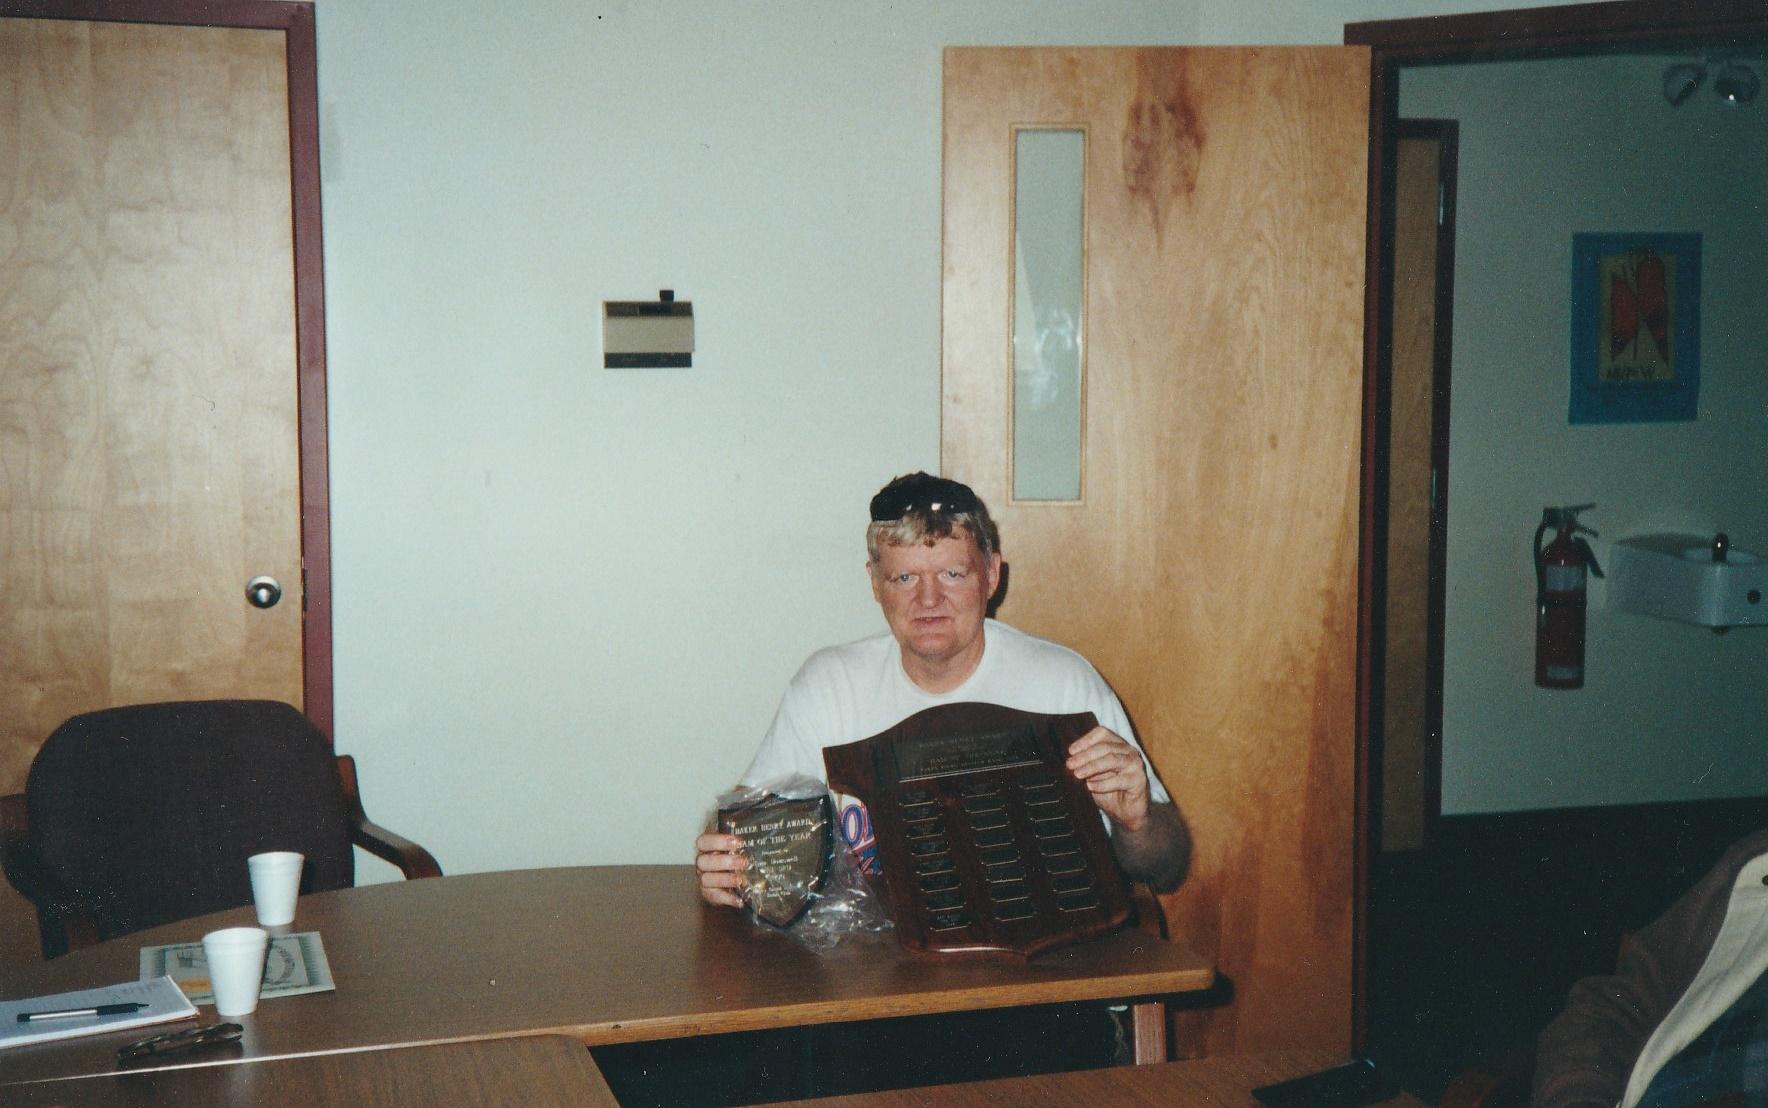 Bh Award Oct 2000 1